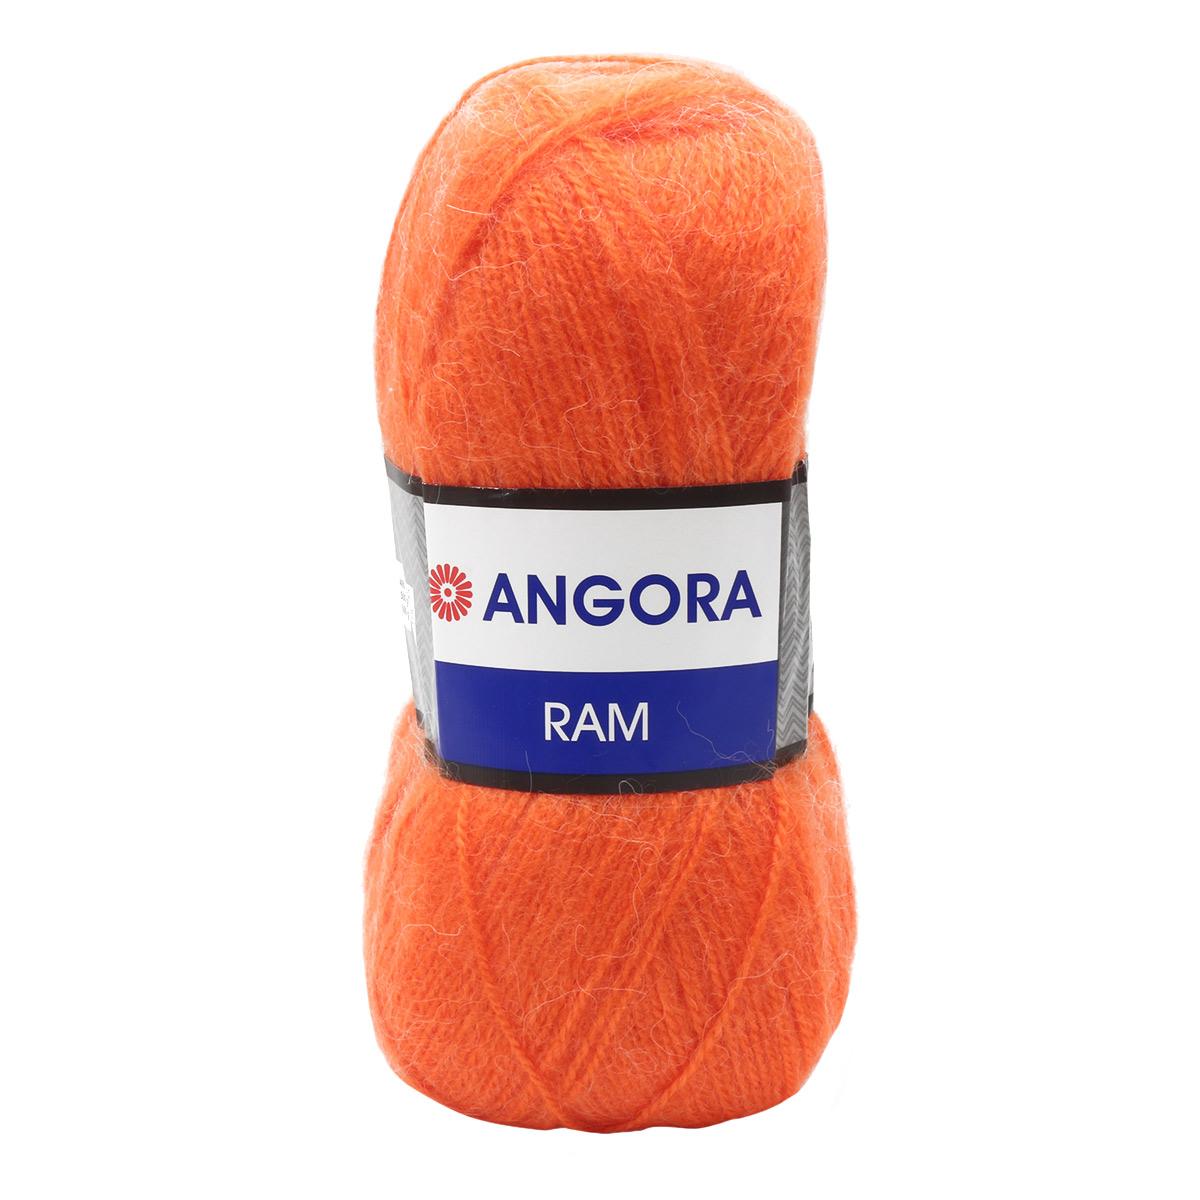 Пряжа YarnArt 'Angora RAM' 100гр. 500м (40%мохер, 60%акрил)